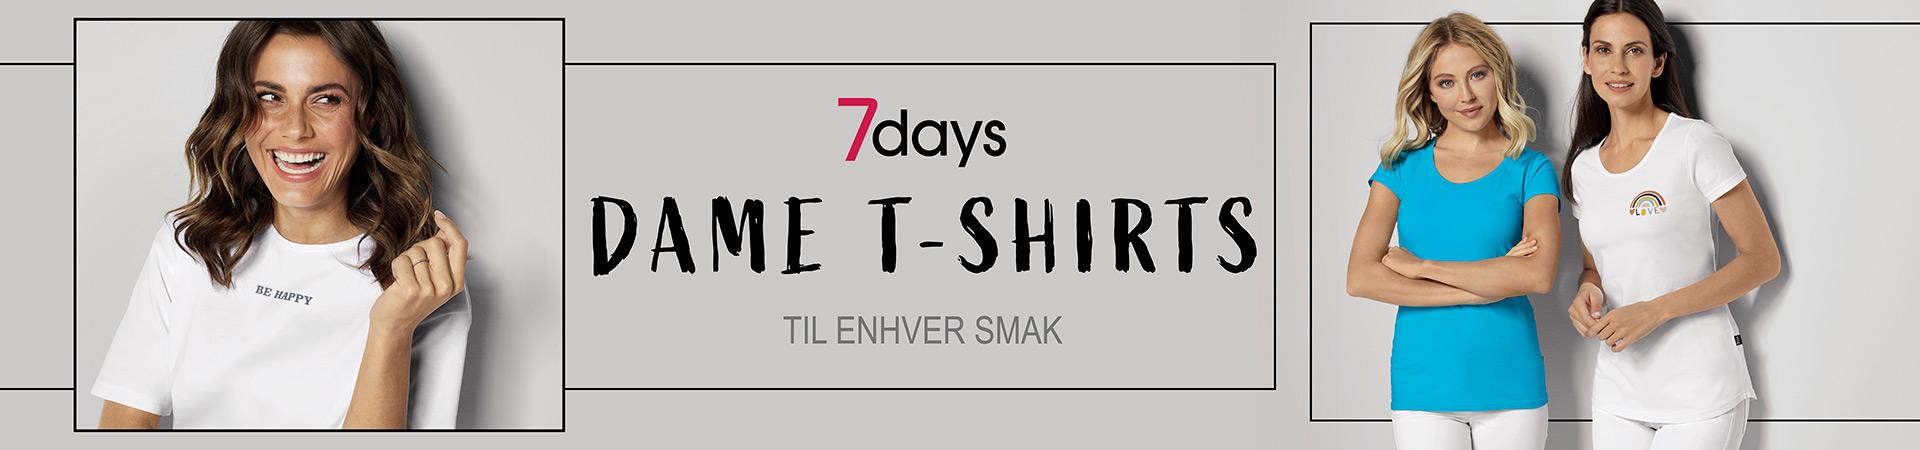 Arbeidsklaer dame t-shirts Praxis 7days